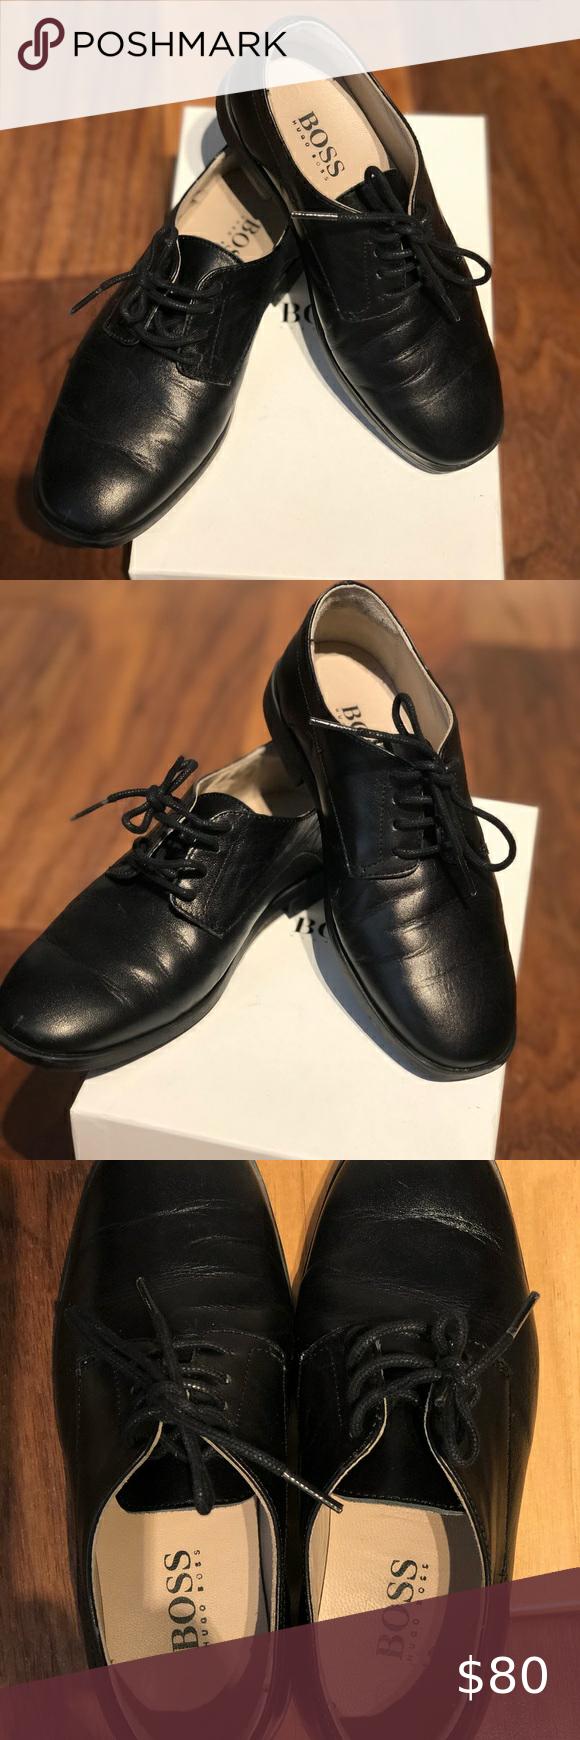 Hugo boss shoes, Black leather shoes